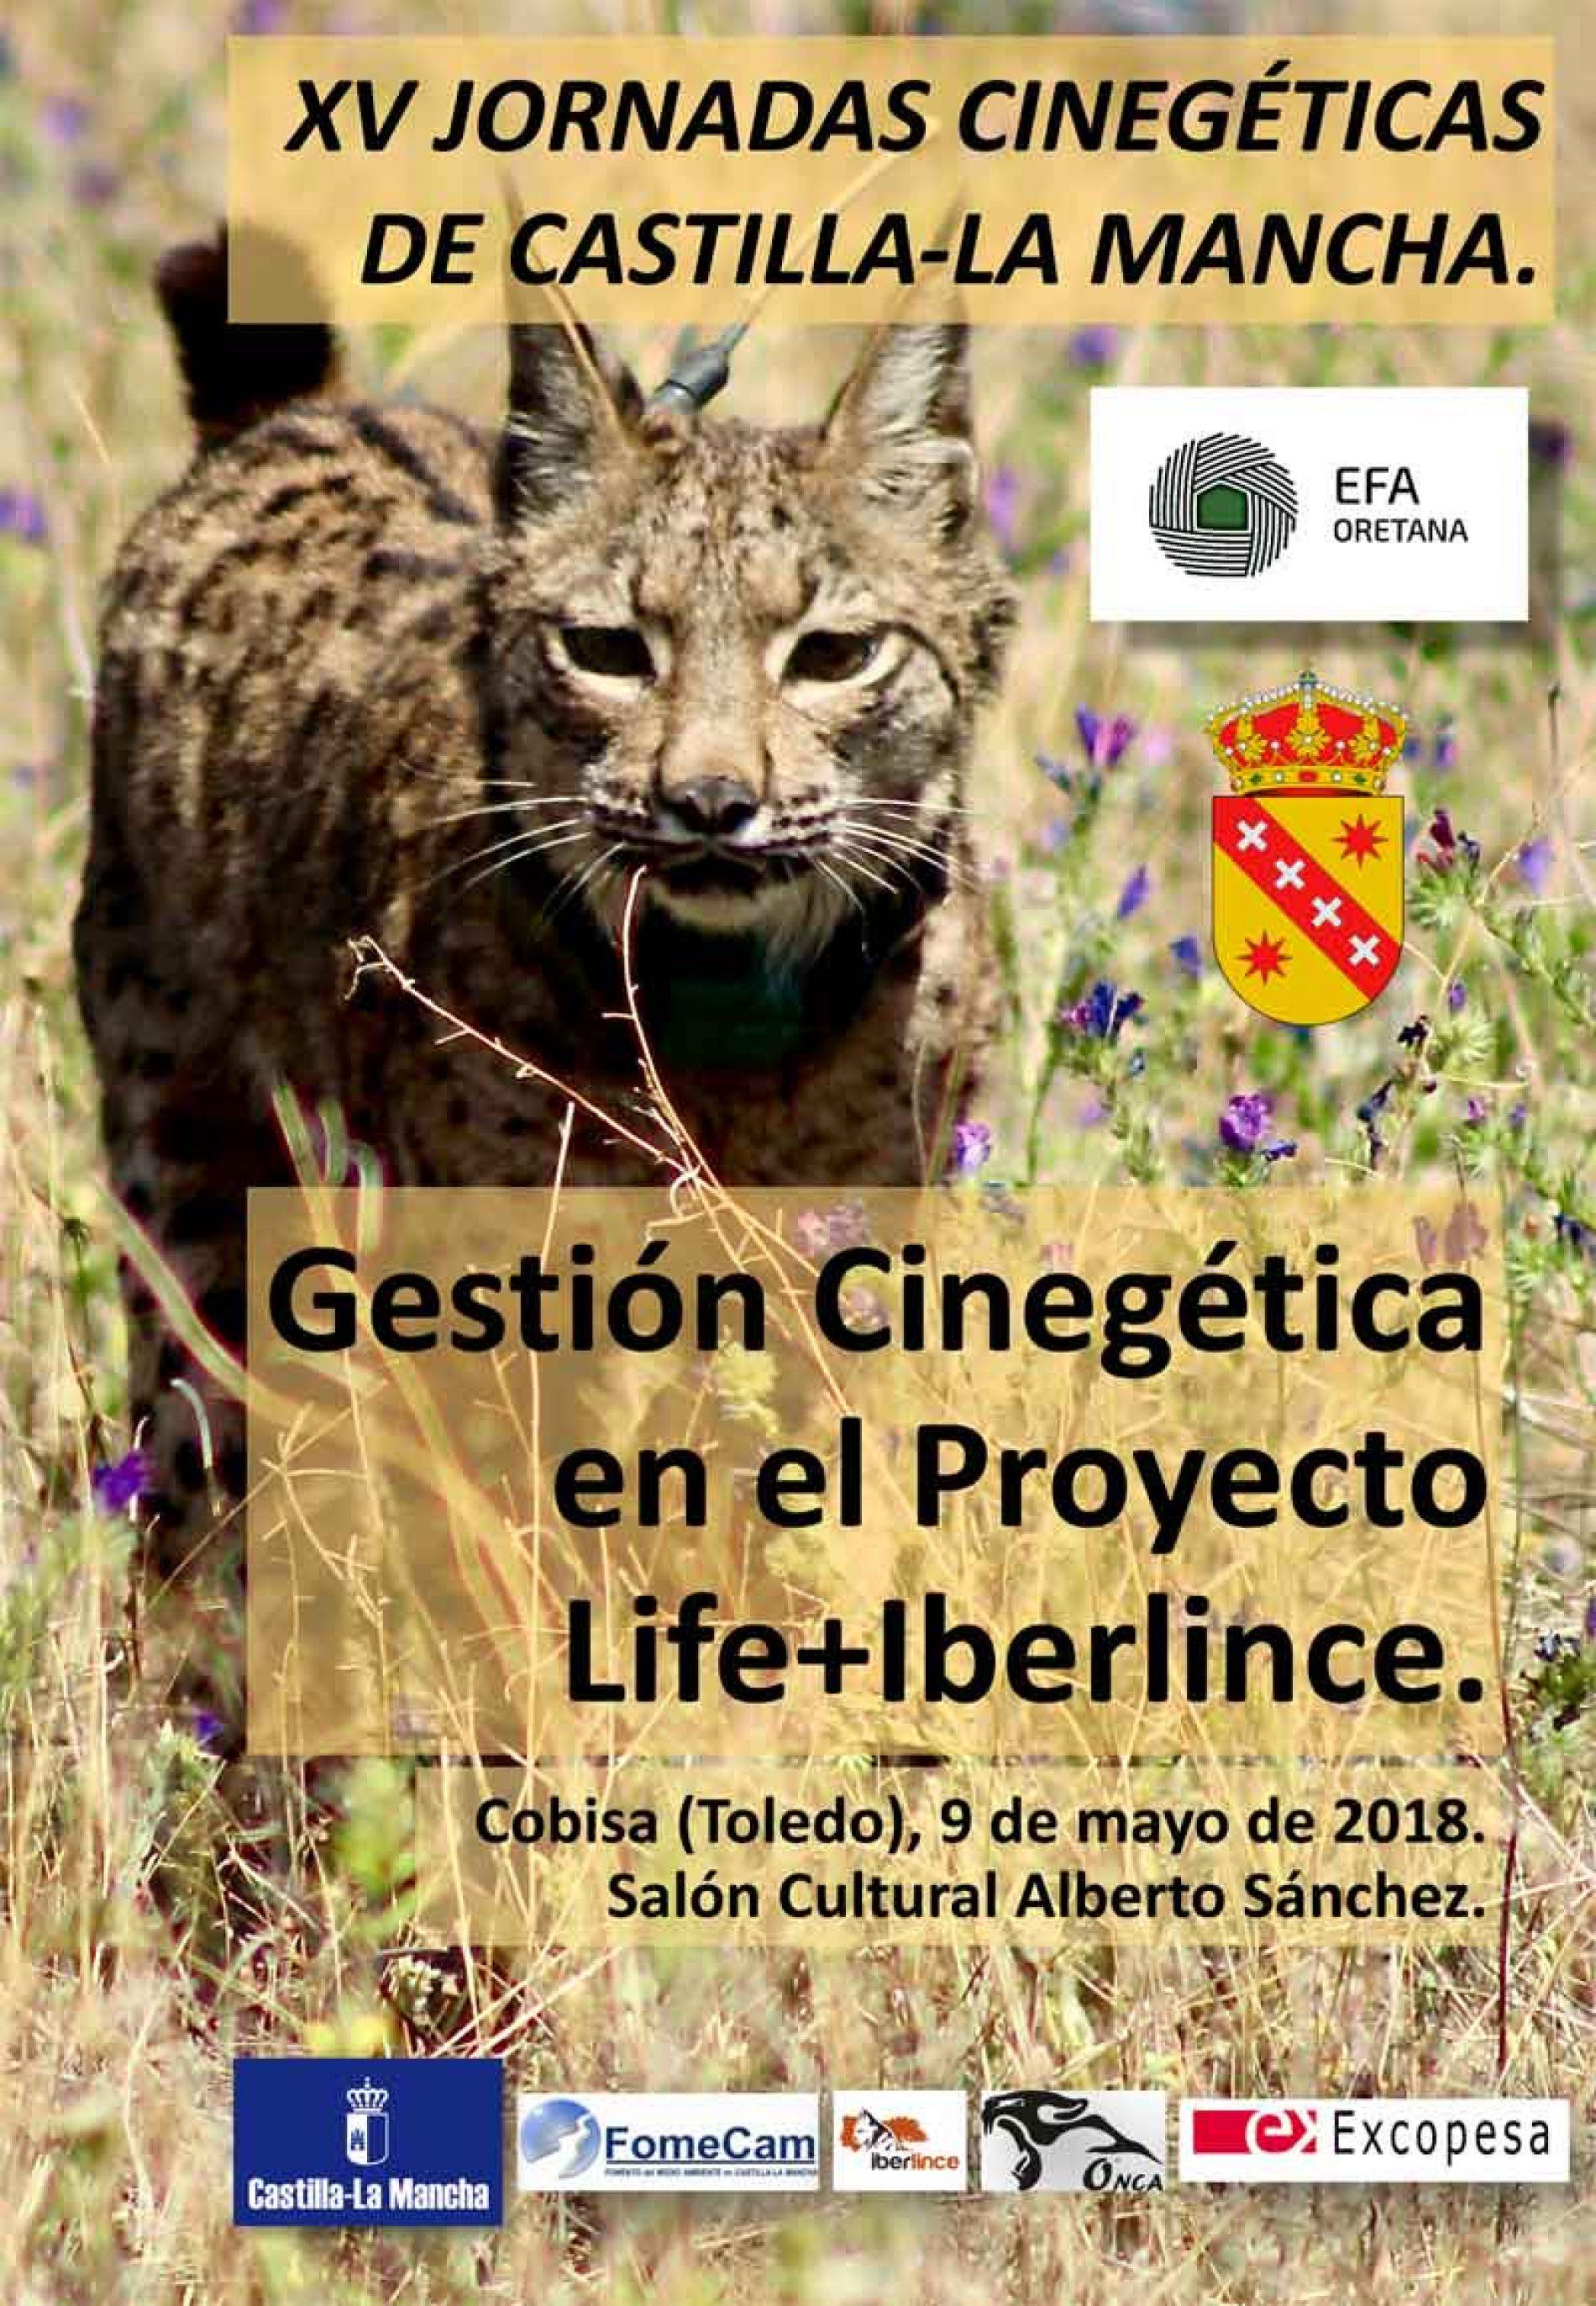 XV Jornadas cinegéticas de Castilla-La-Mancha